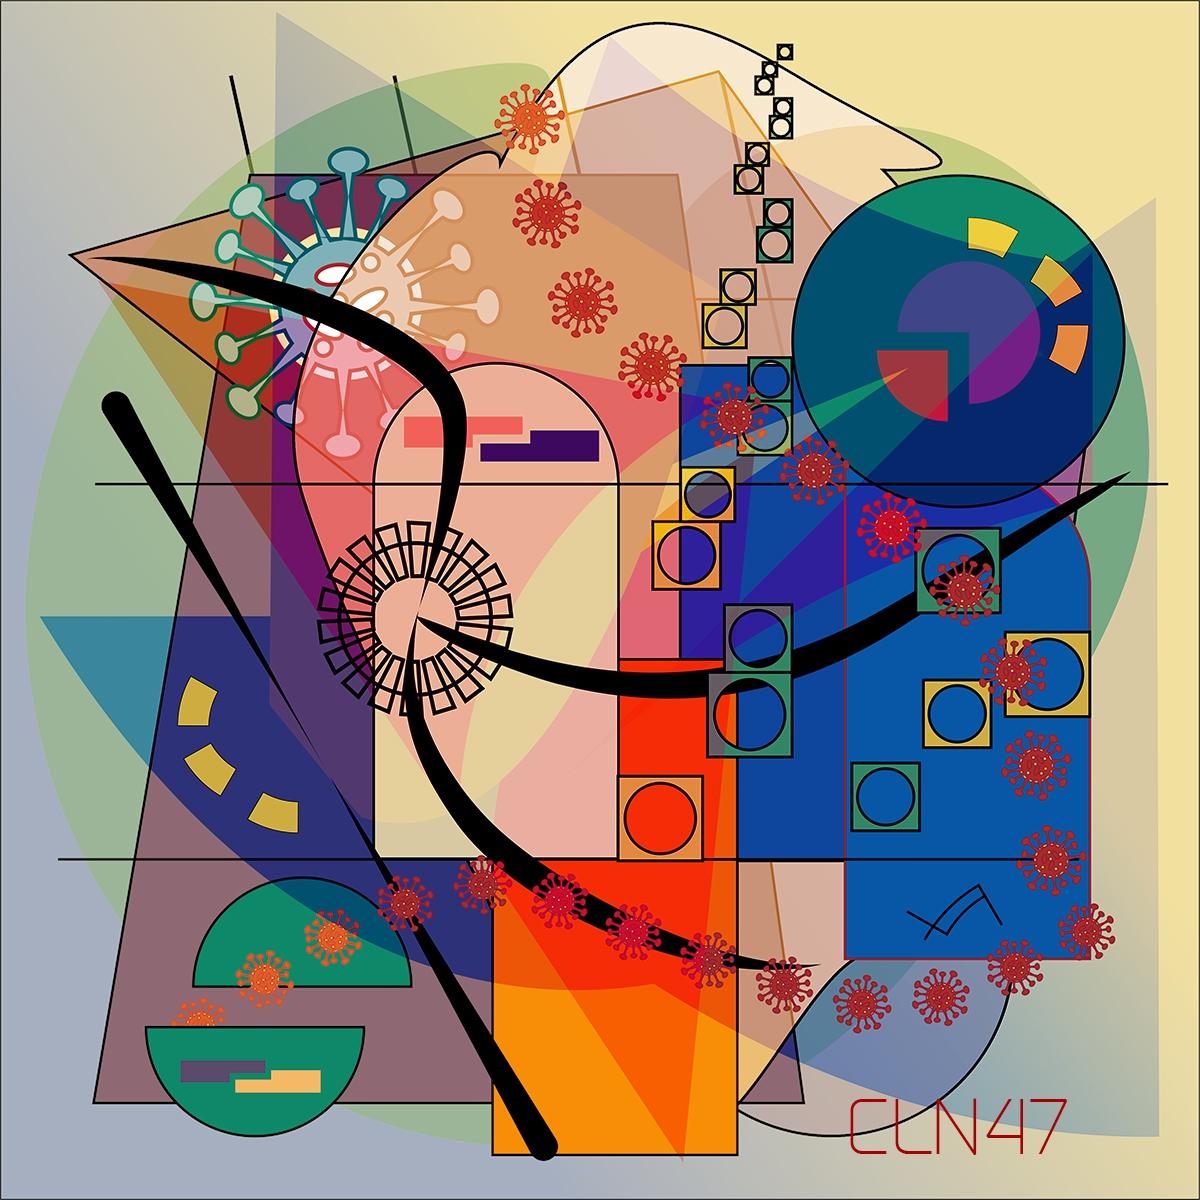 Clemens Niewöhner Corona Covid Themed Art - Pandora's box